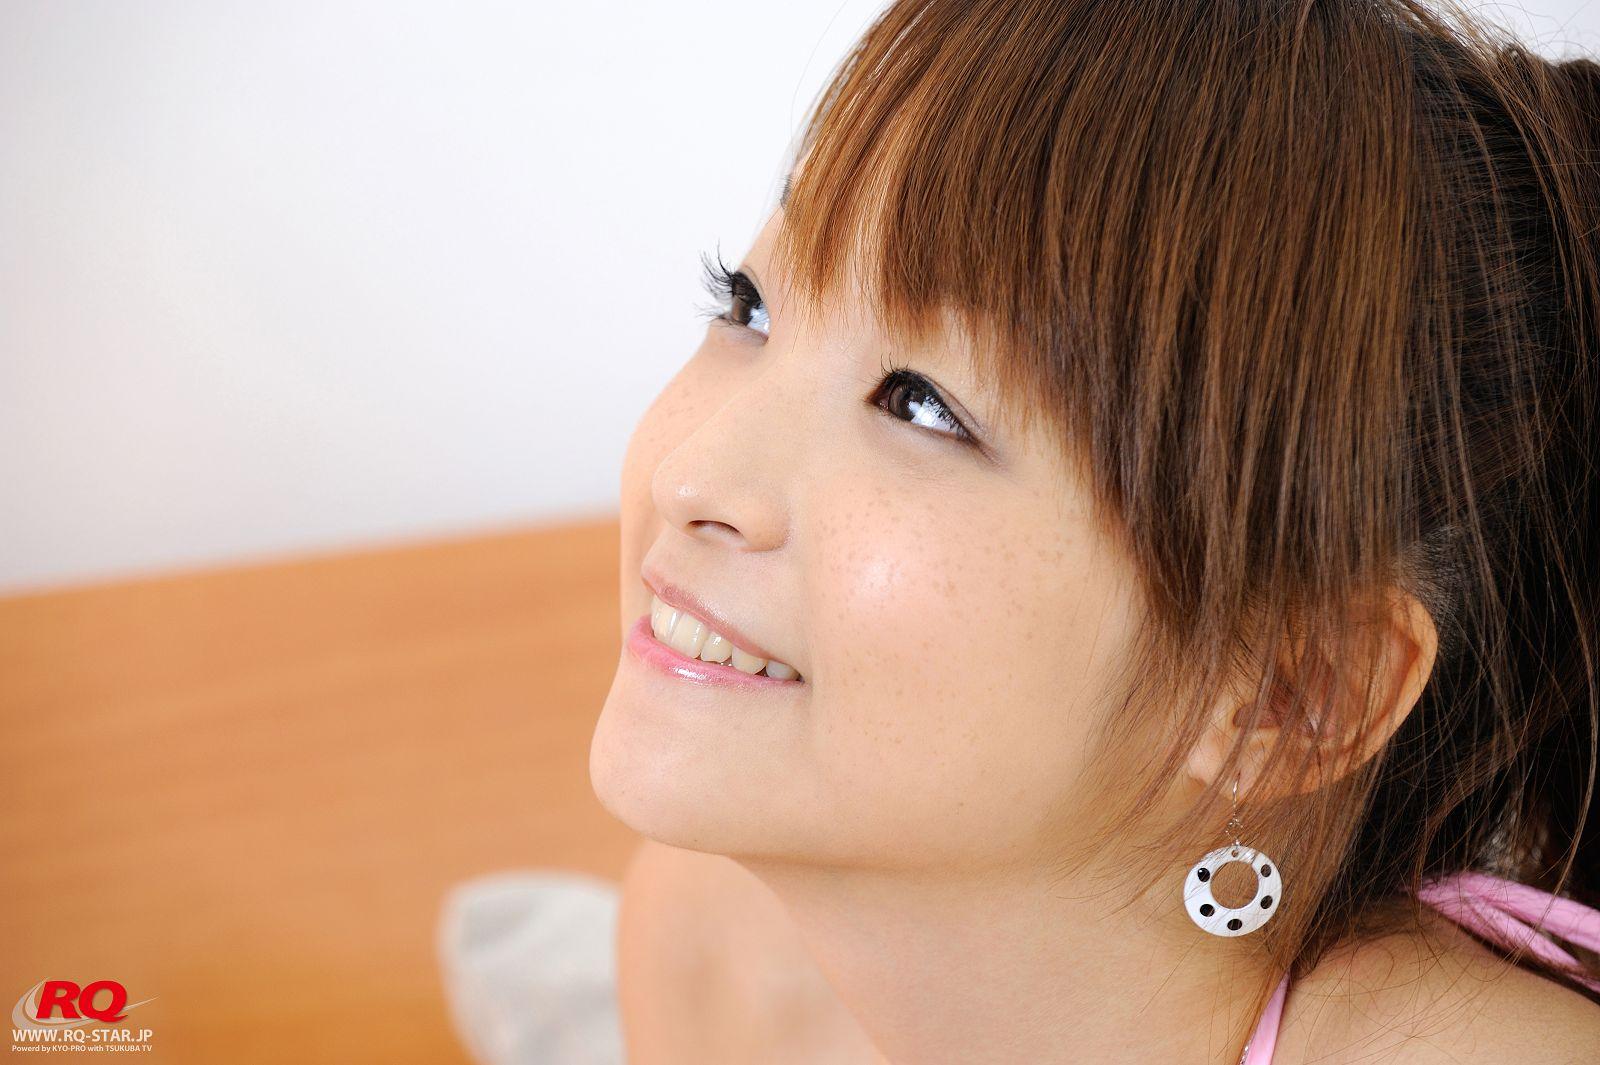 [RQ STAR美女] NO.0098 Mio Aoki 青木未央 Swim Suits Pink[67P] RQ STAR 第4张